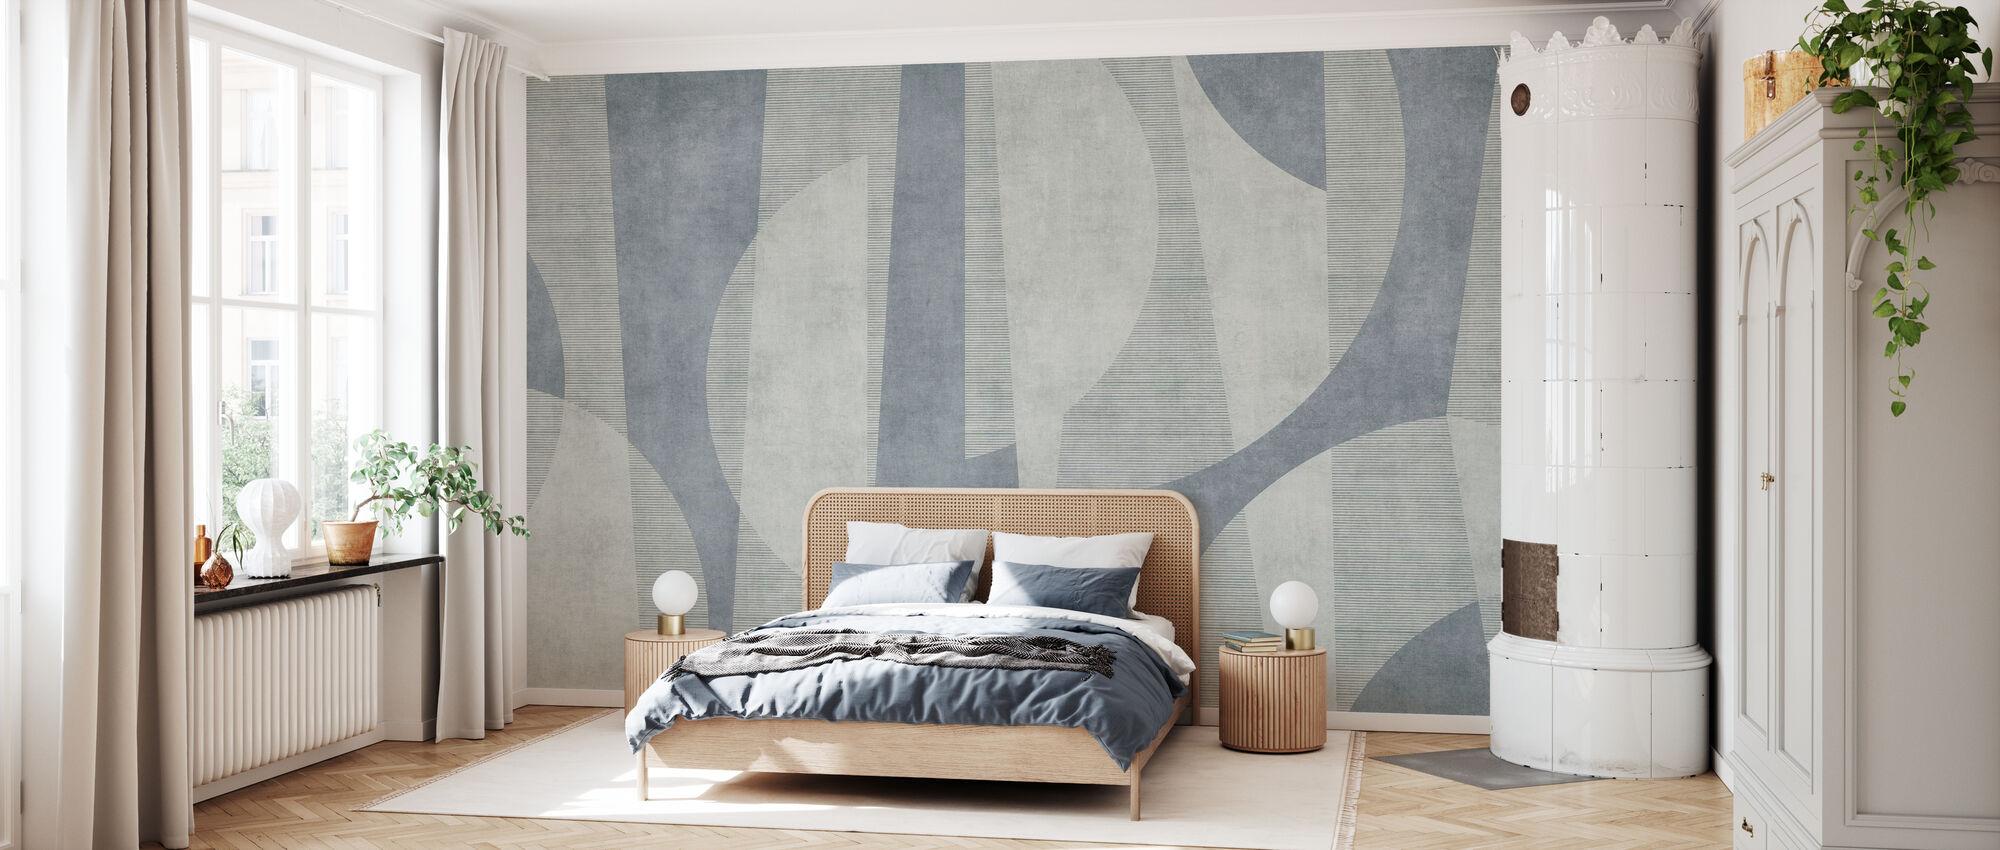 Ipanema Beach - Blue - Wallpaper - Bedroom